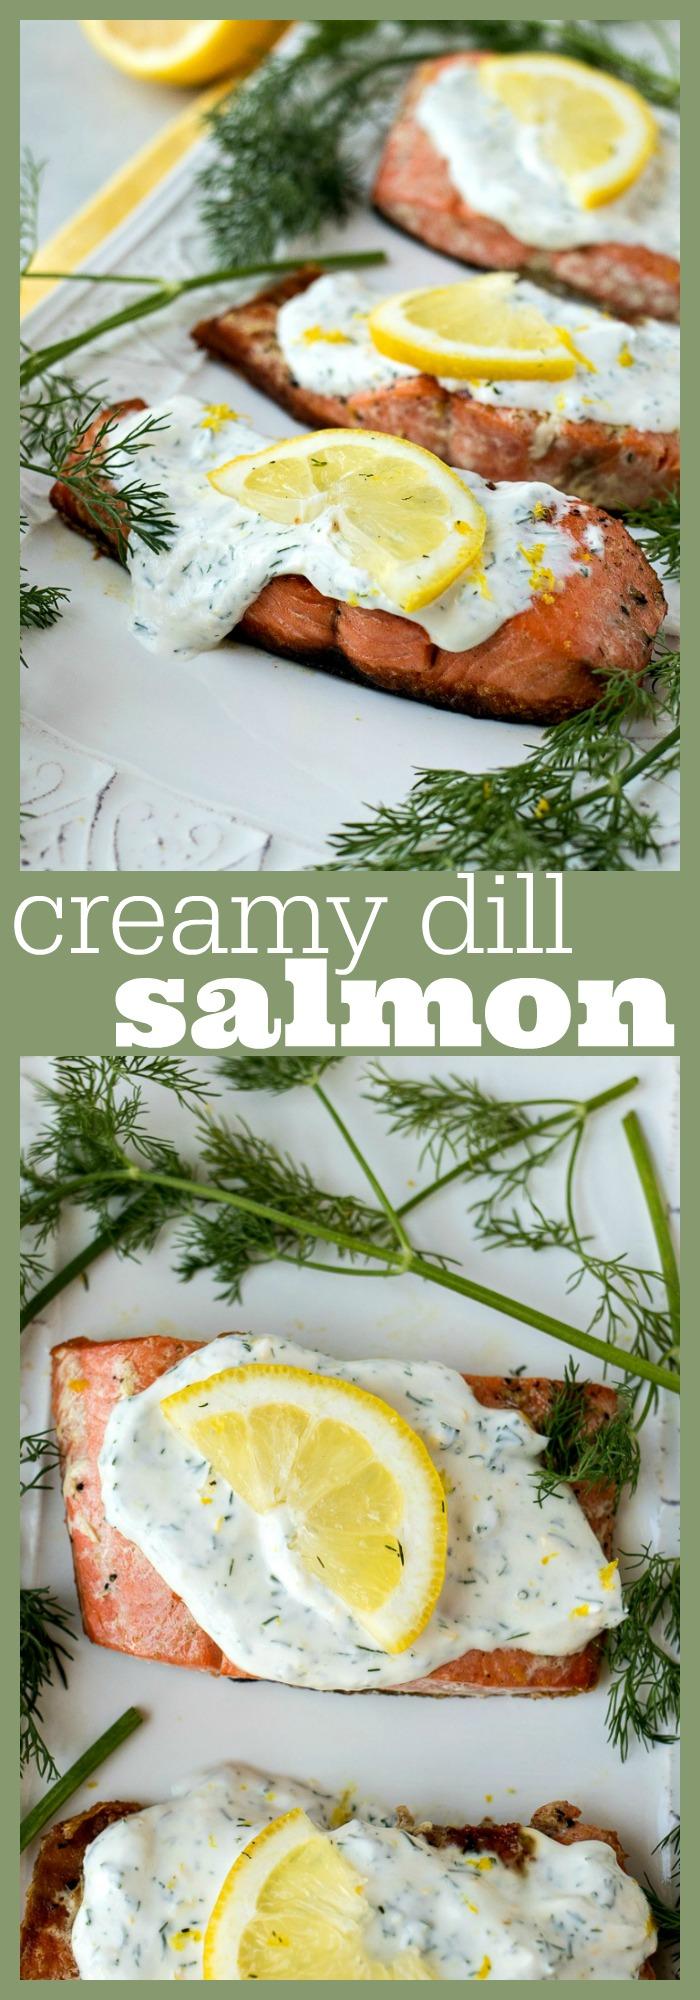 Creamy Dill Salmon photo collage